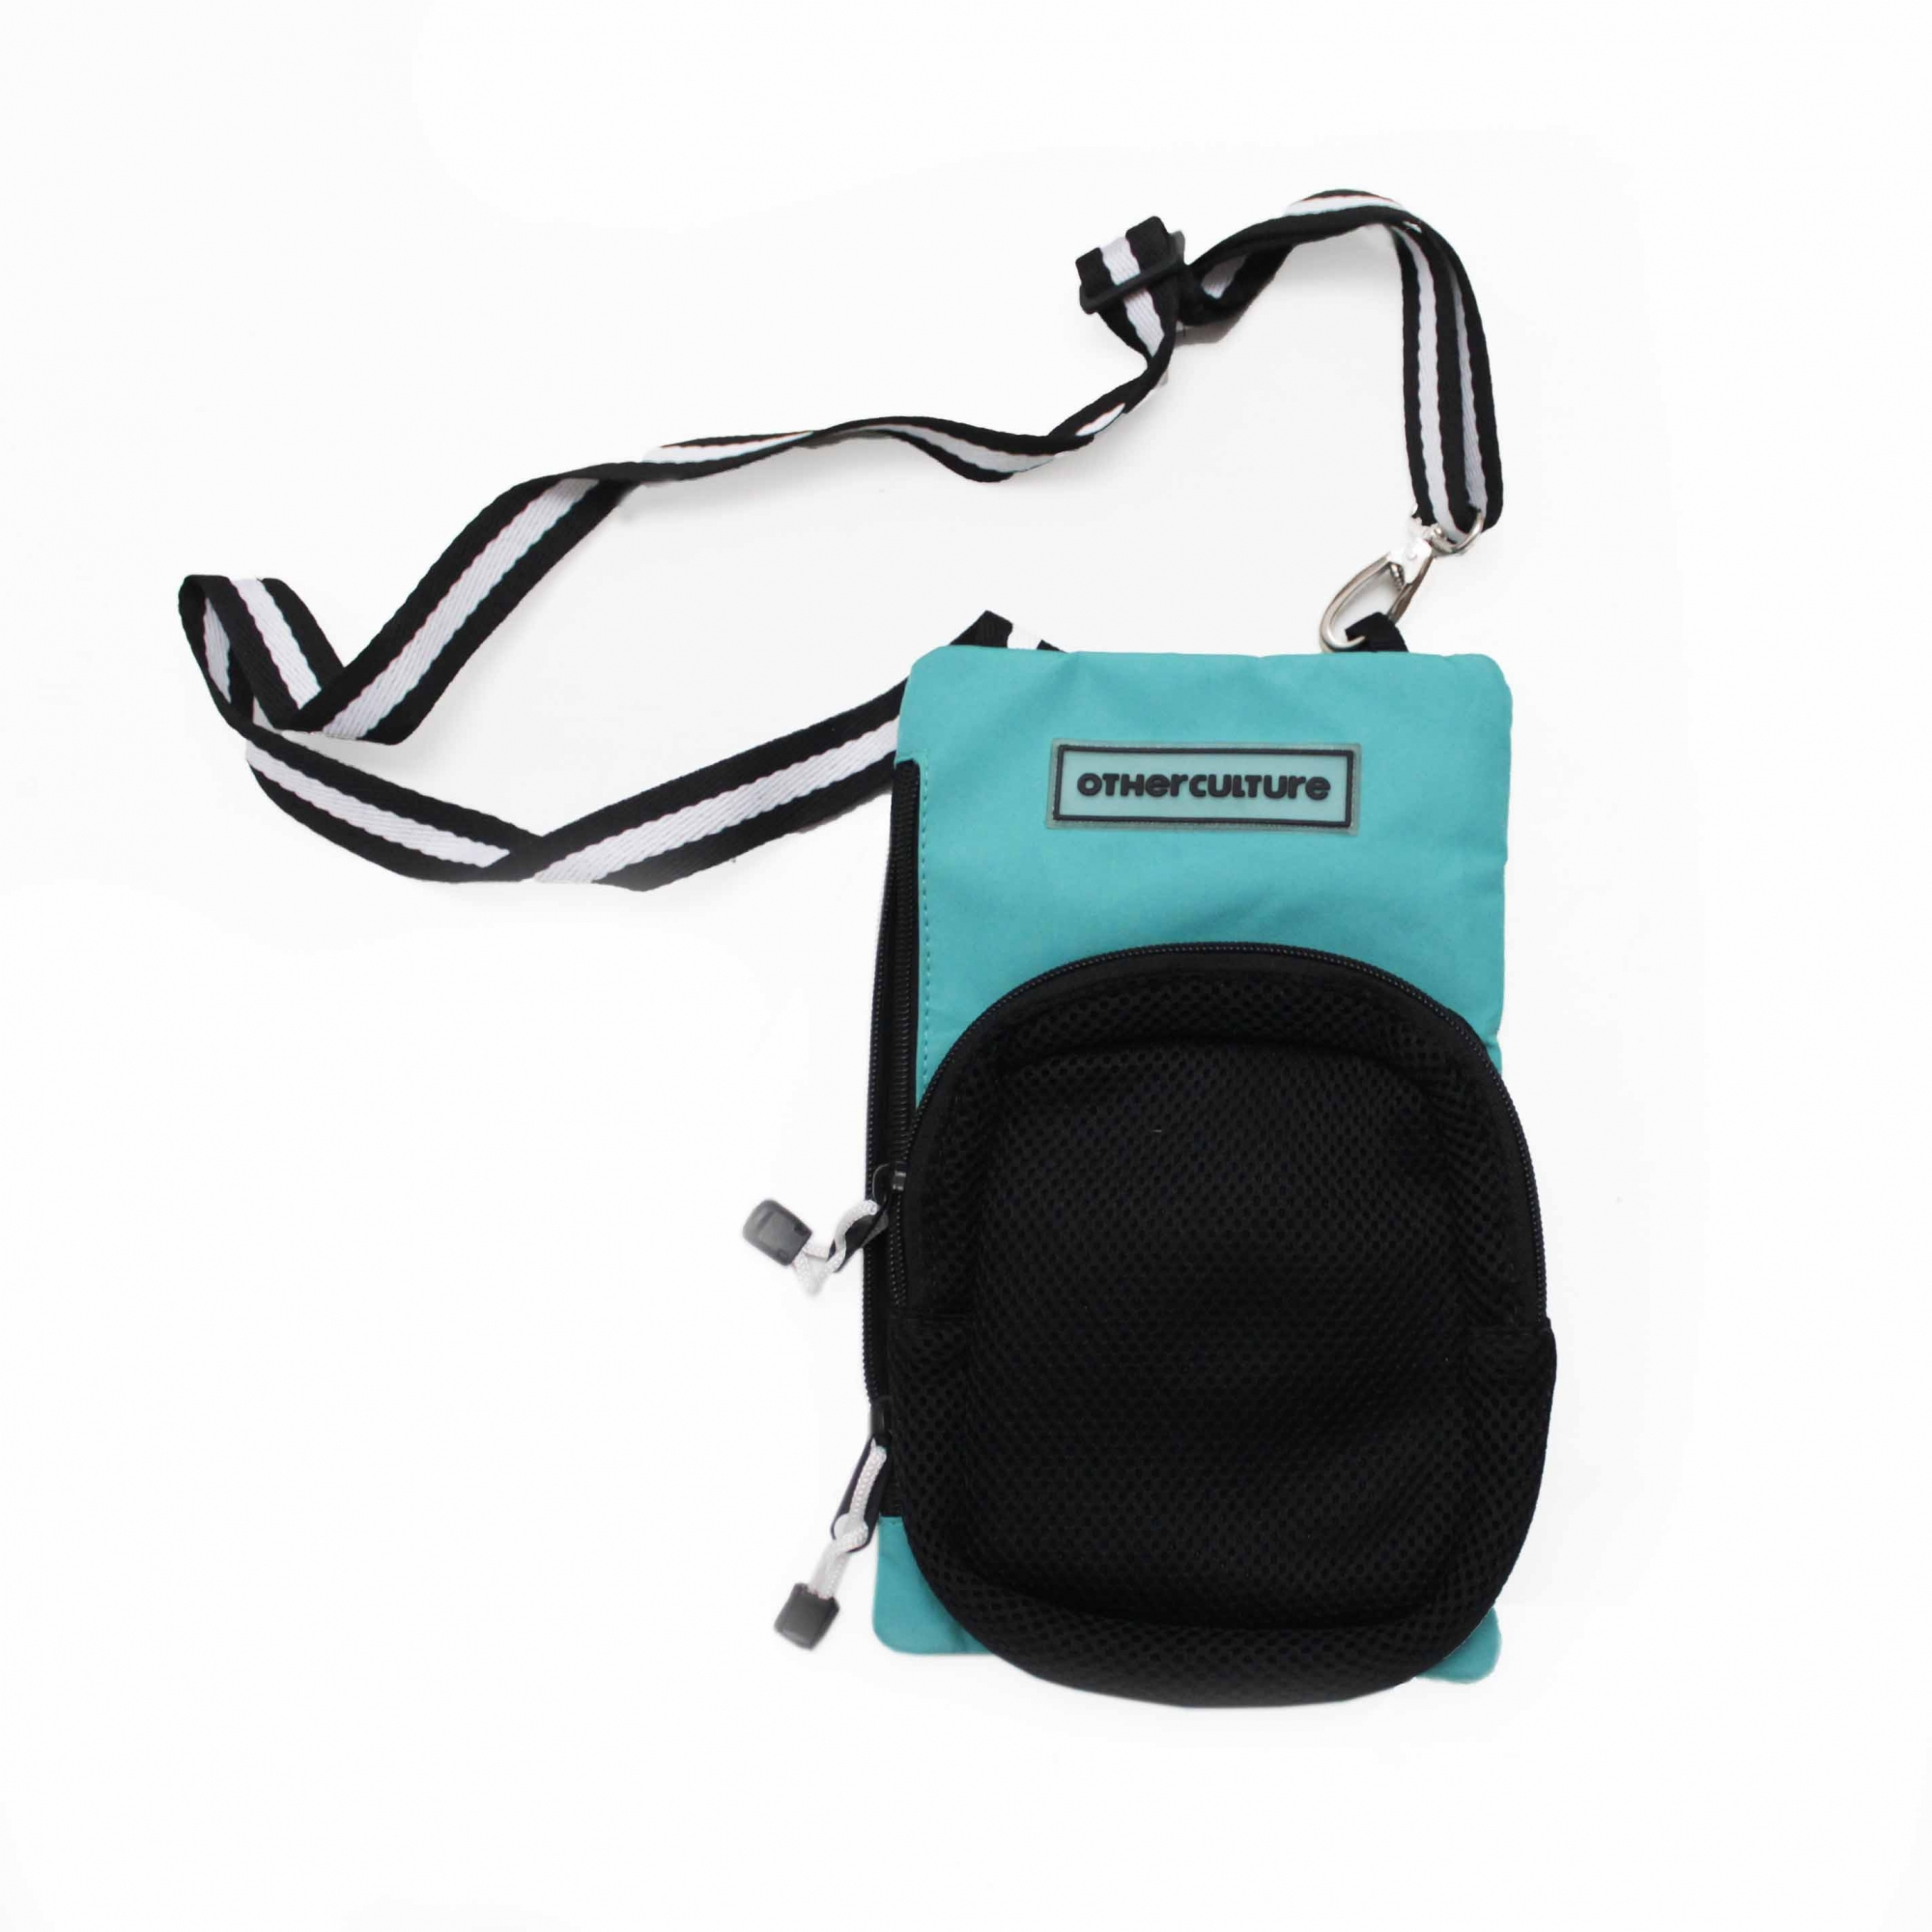 Shoulder Bag Other Culture Sport Tiffany - Azul